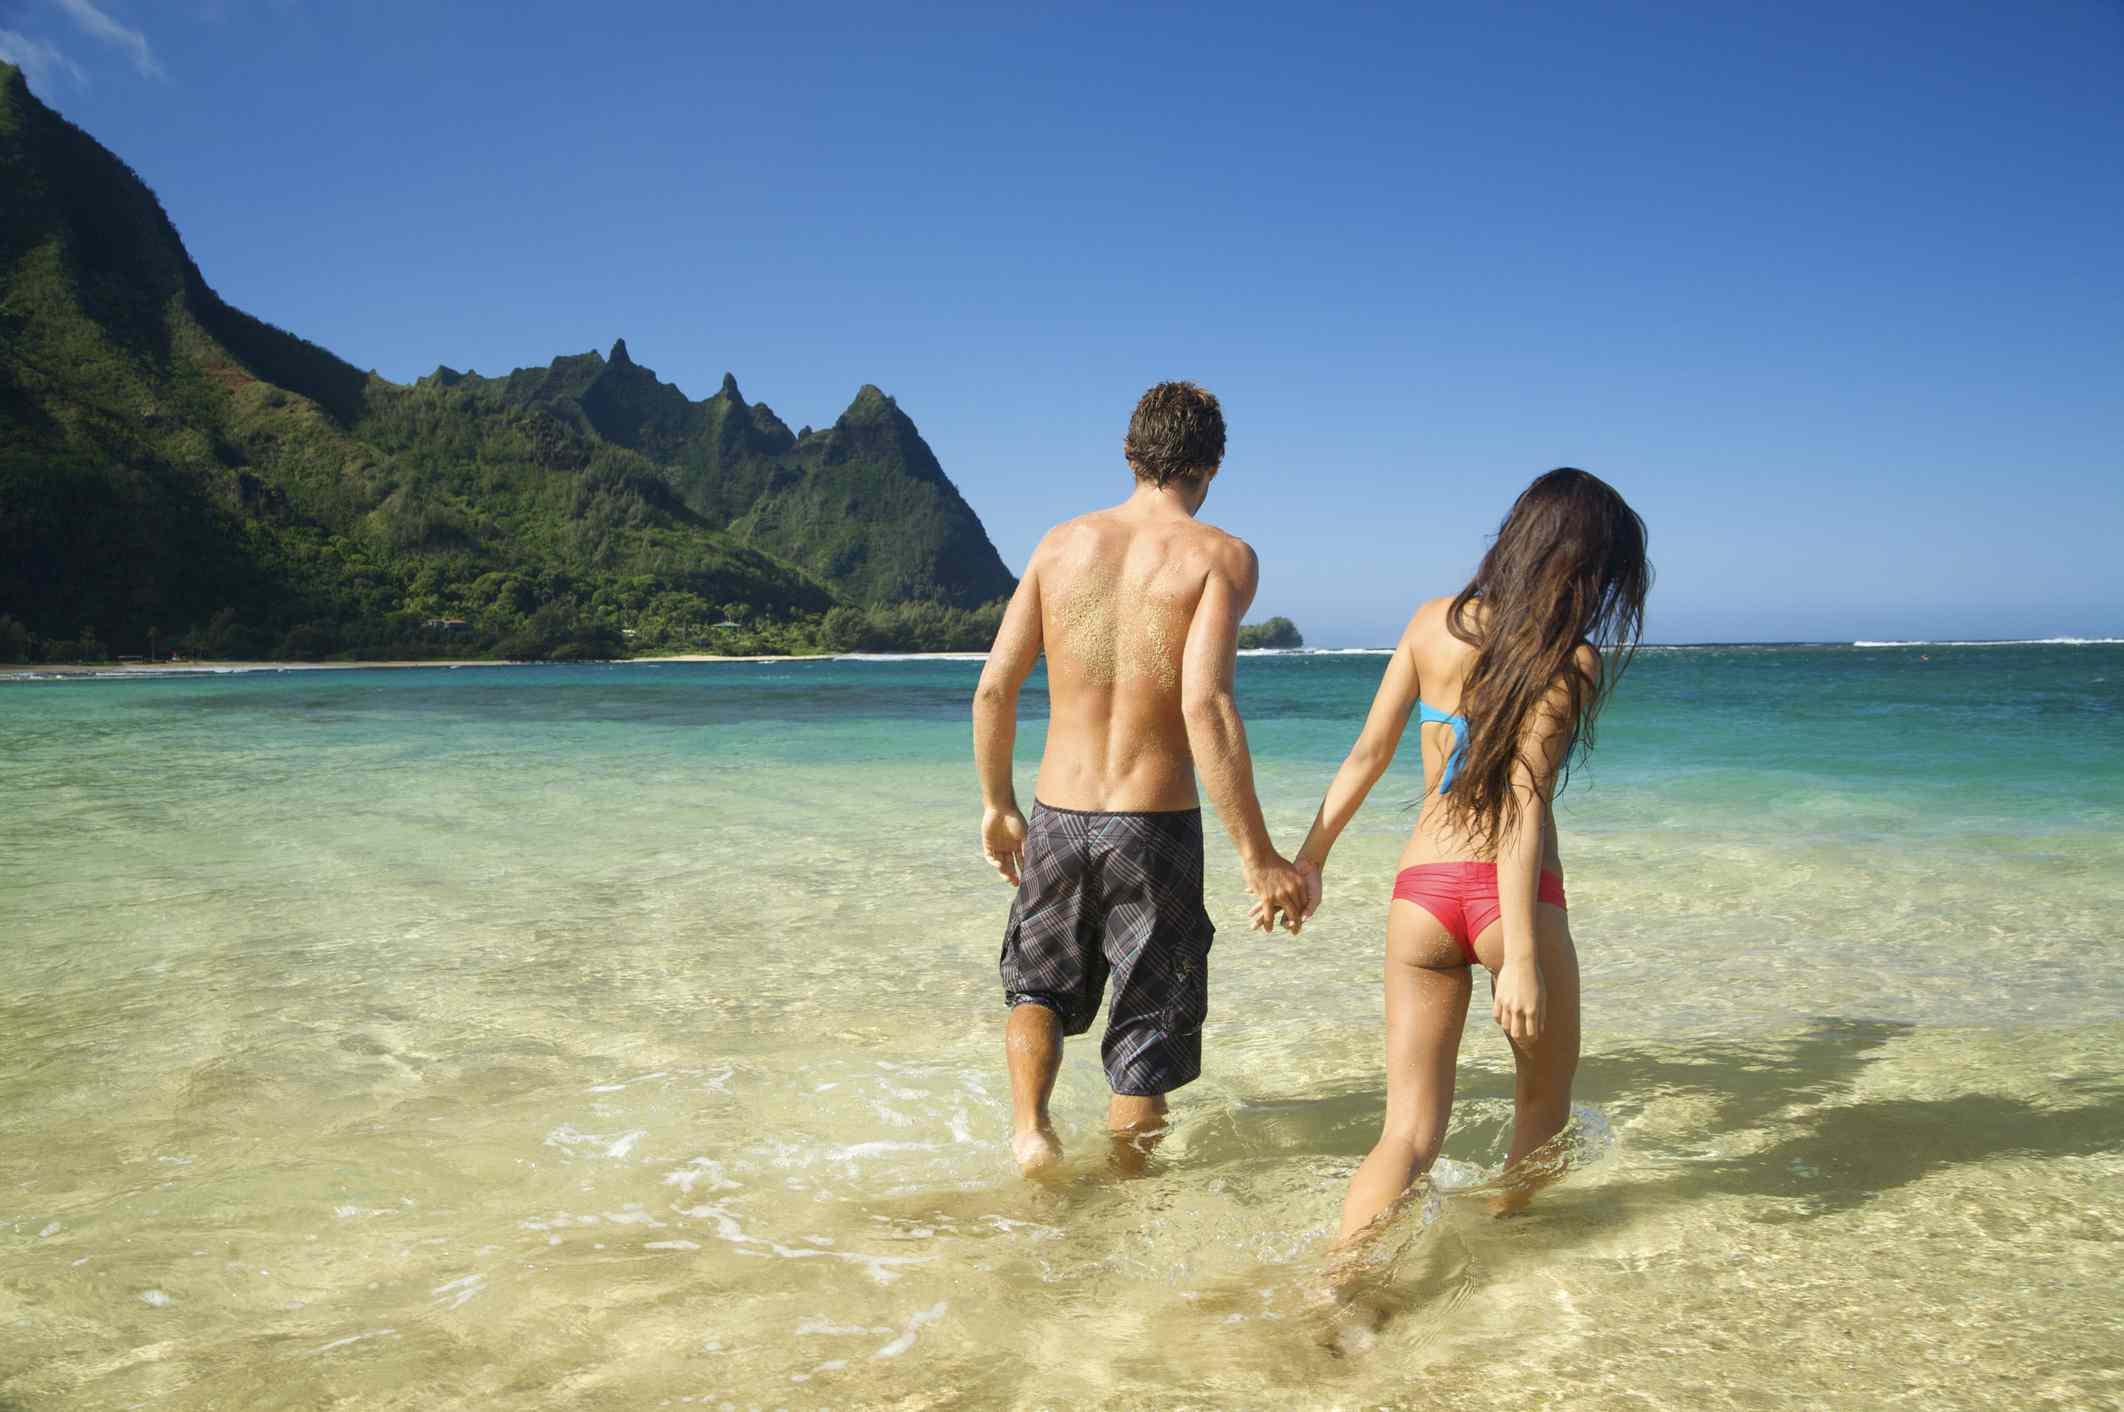 Couple in the Water at Tunnels Beach, Kauai